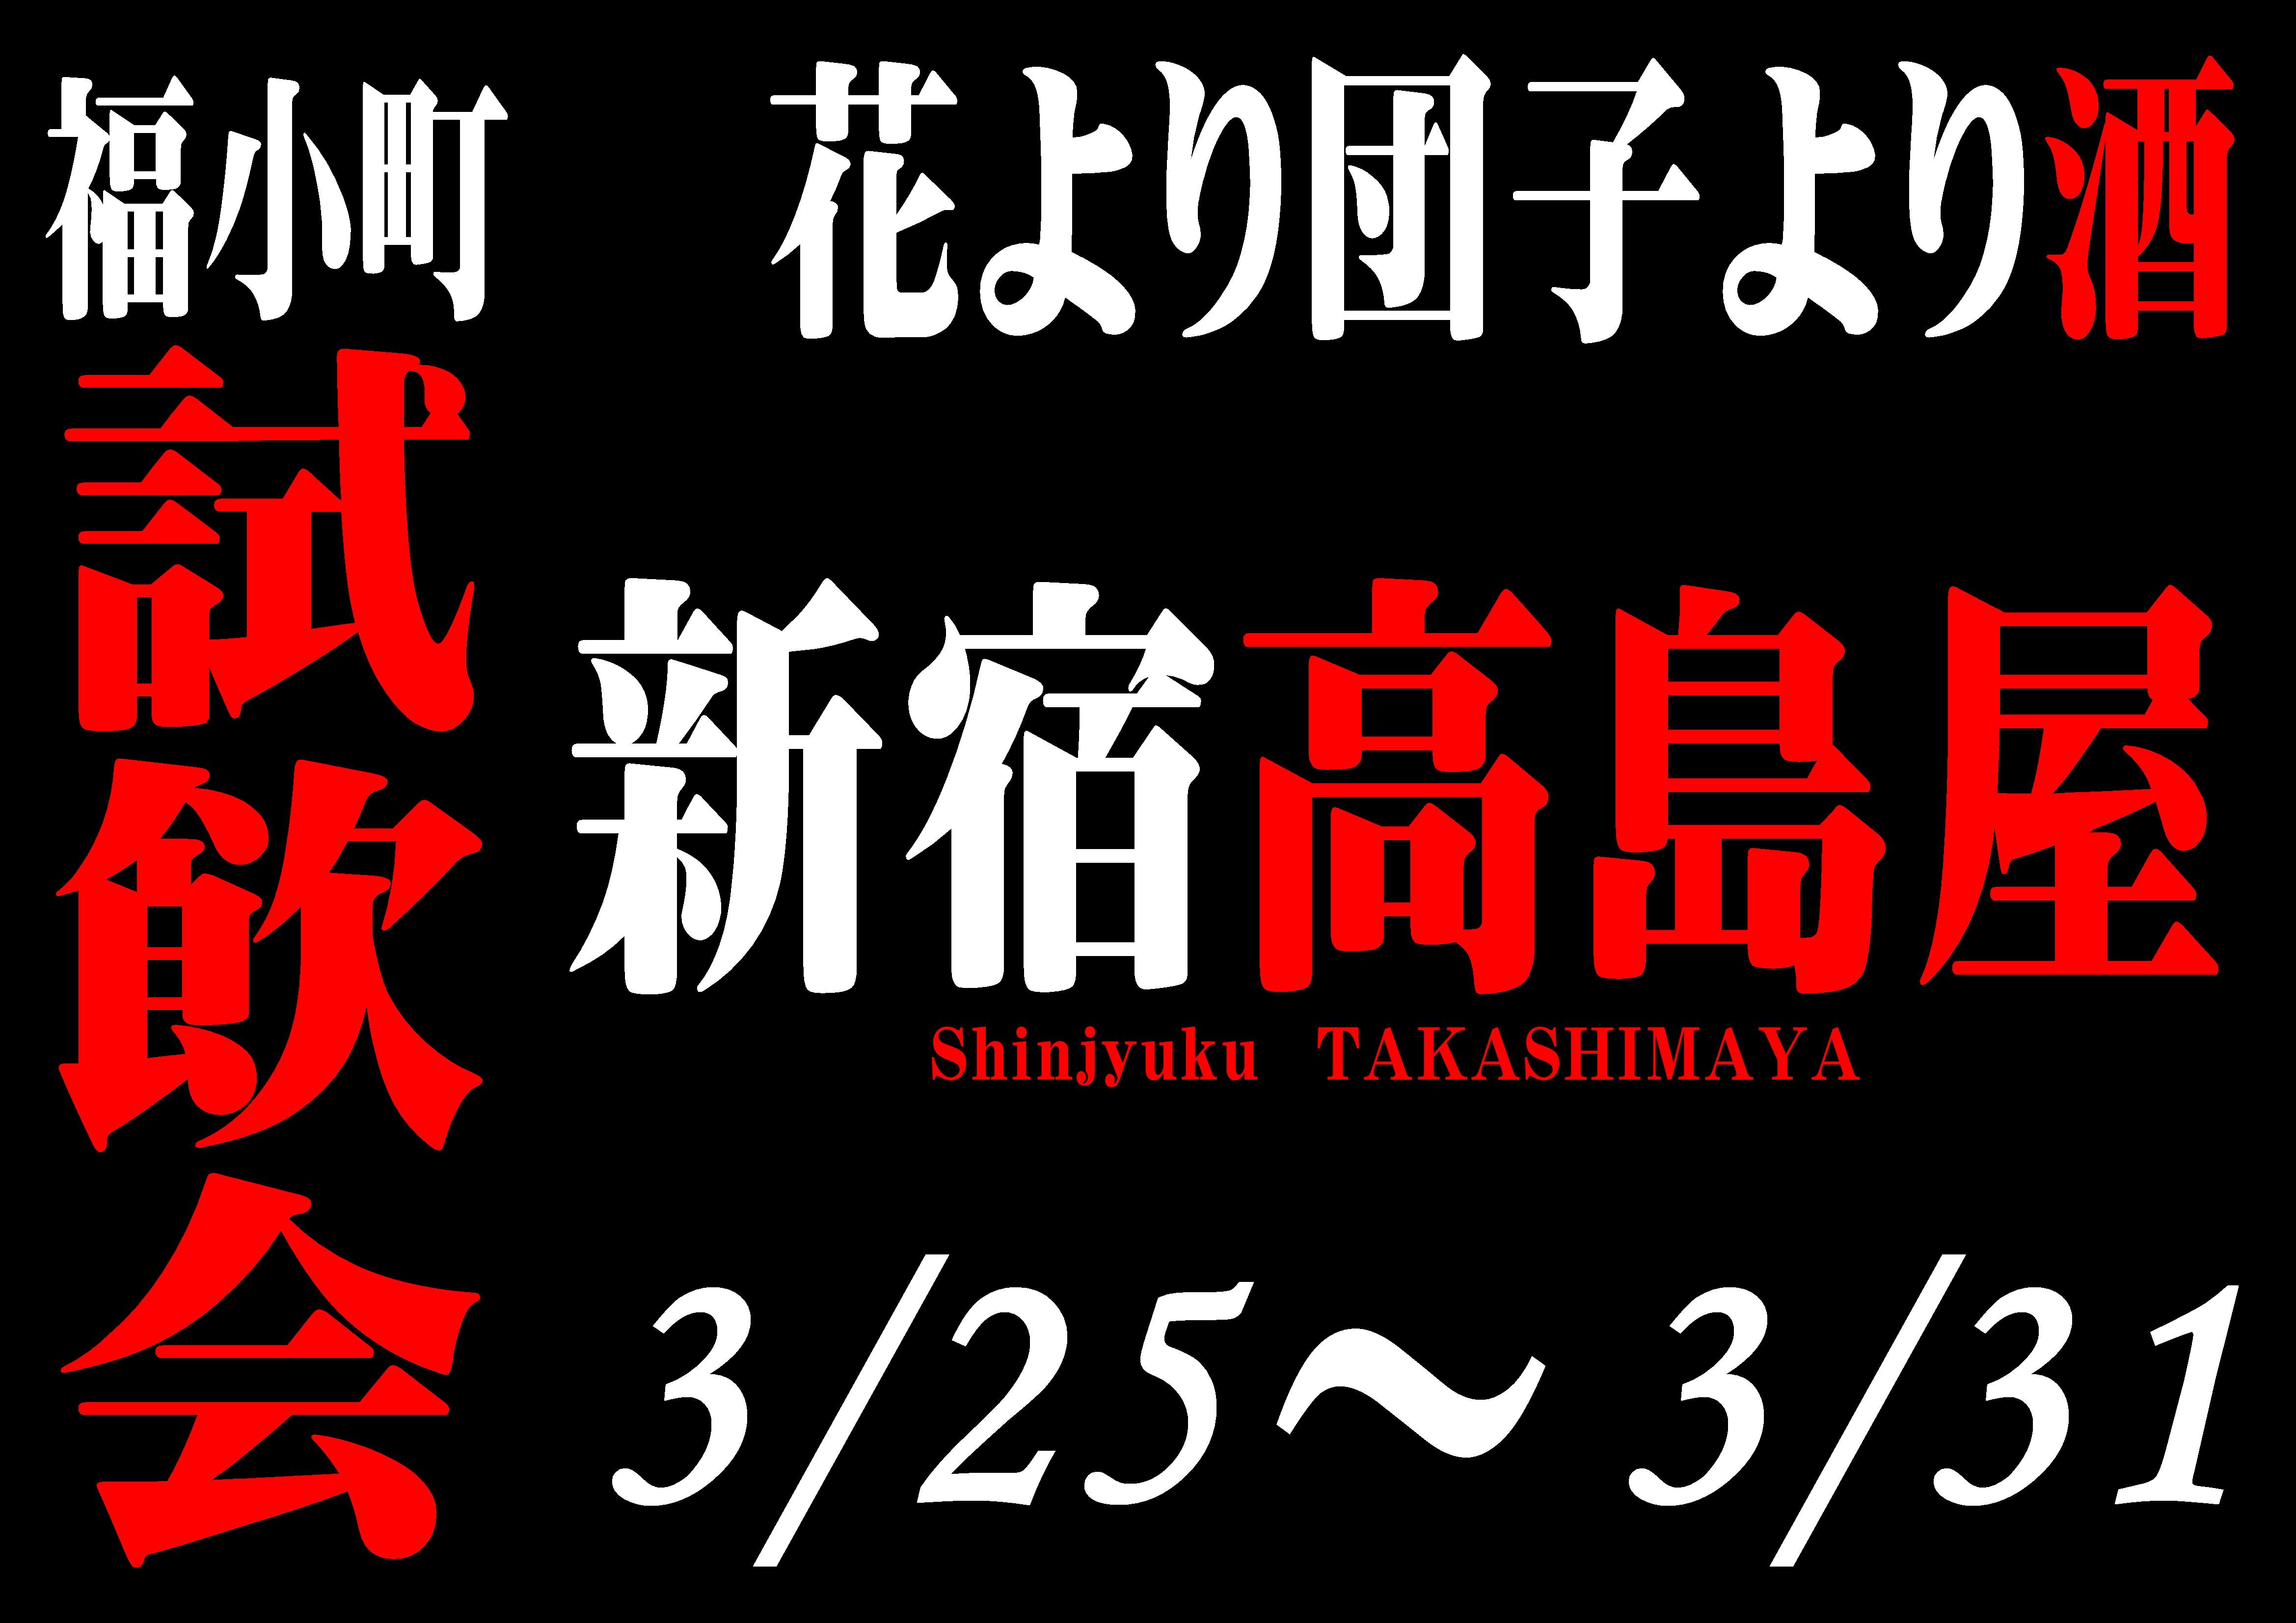 http://www.fukukomachi.com/blog/photo/20200324.JPG